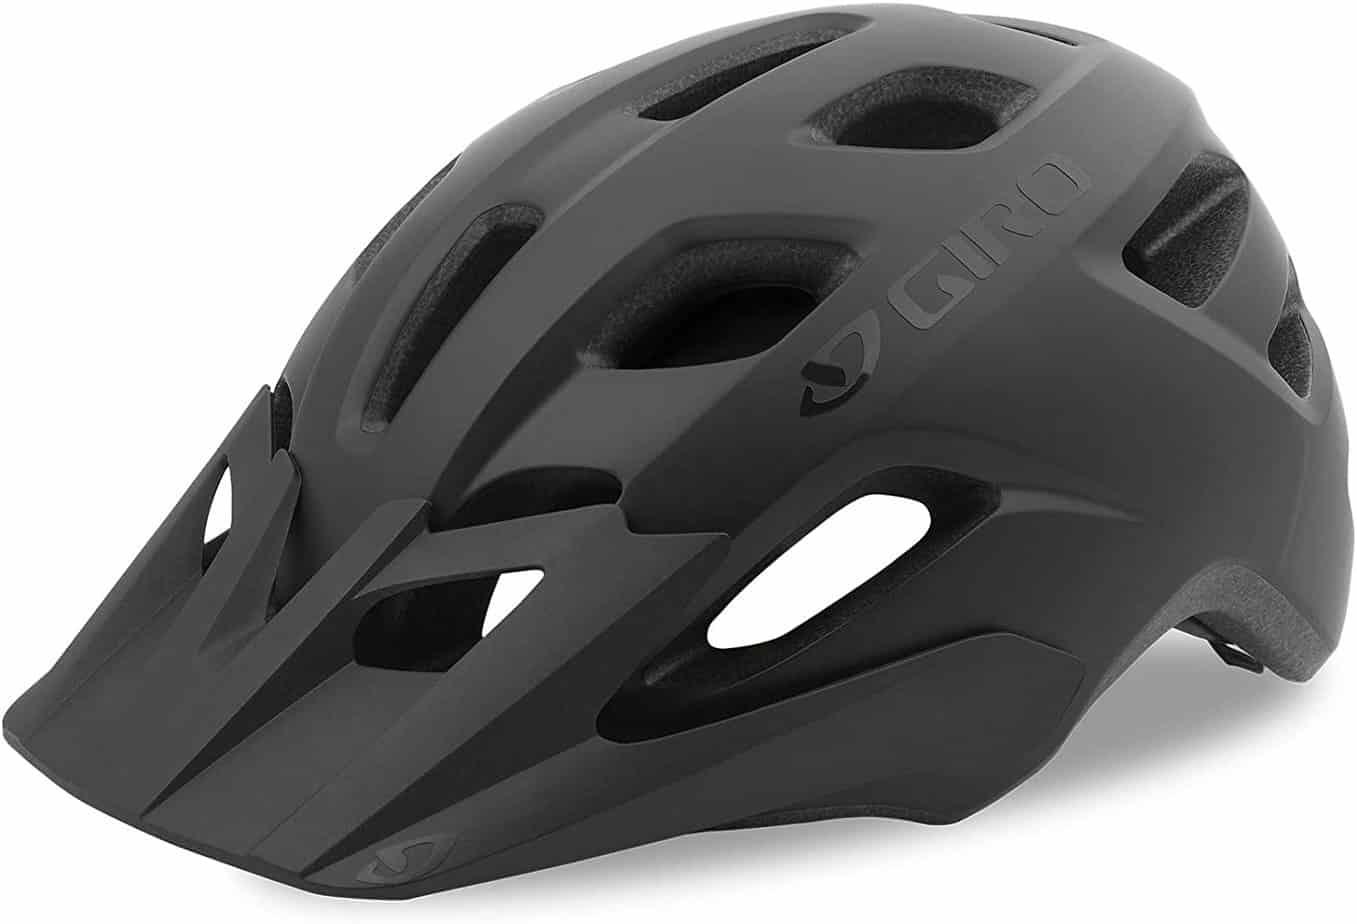 Giro Fixture MIPS Adult Dirt Cycling Helmet | Amazon